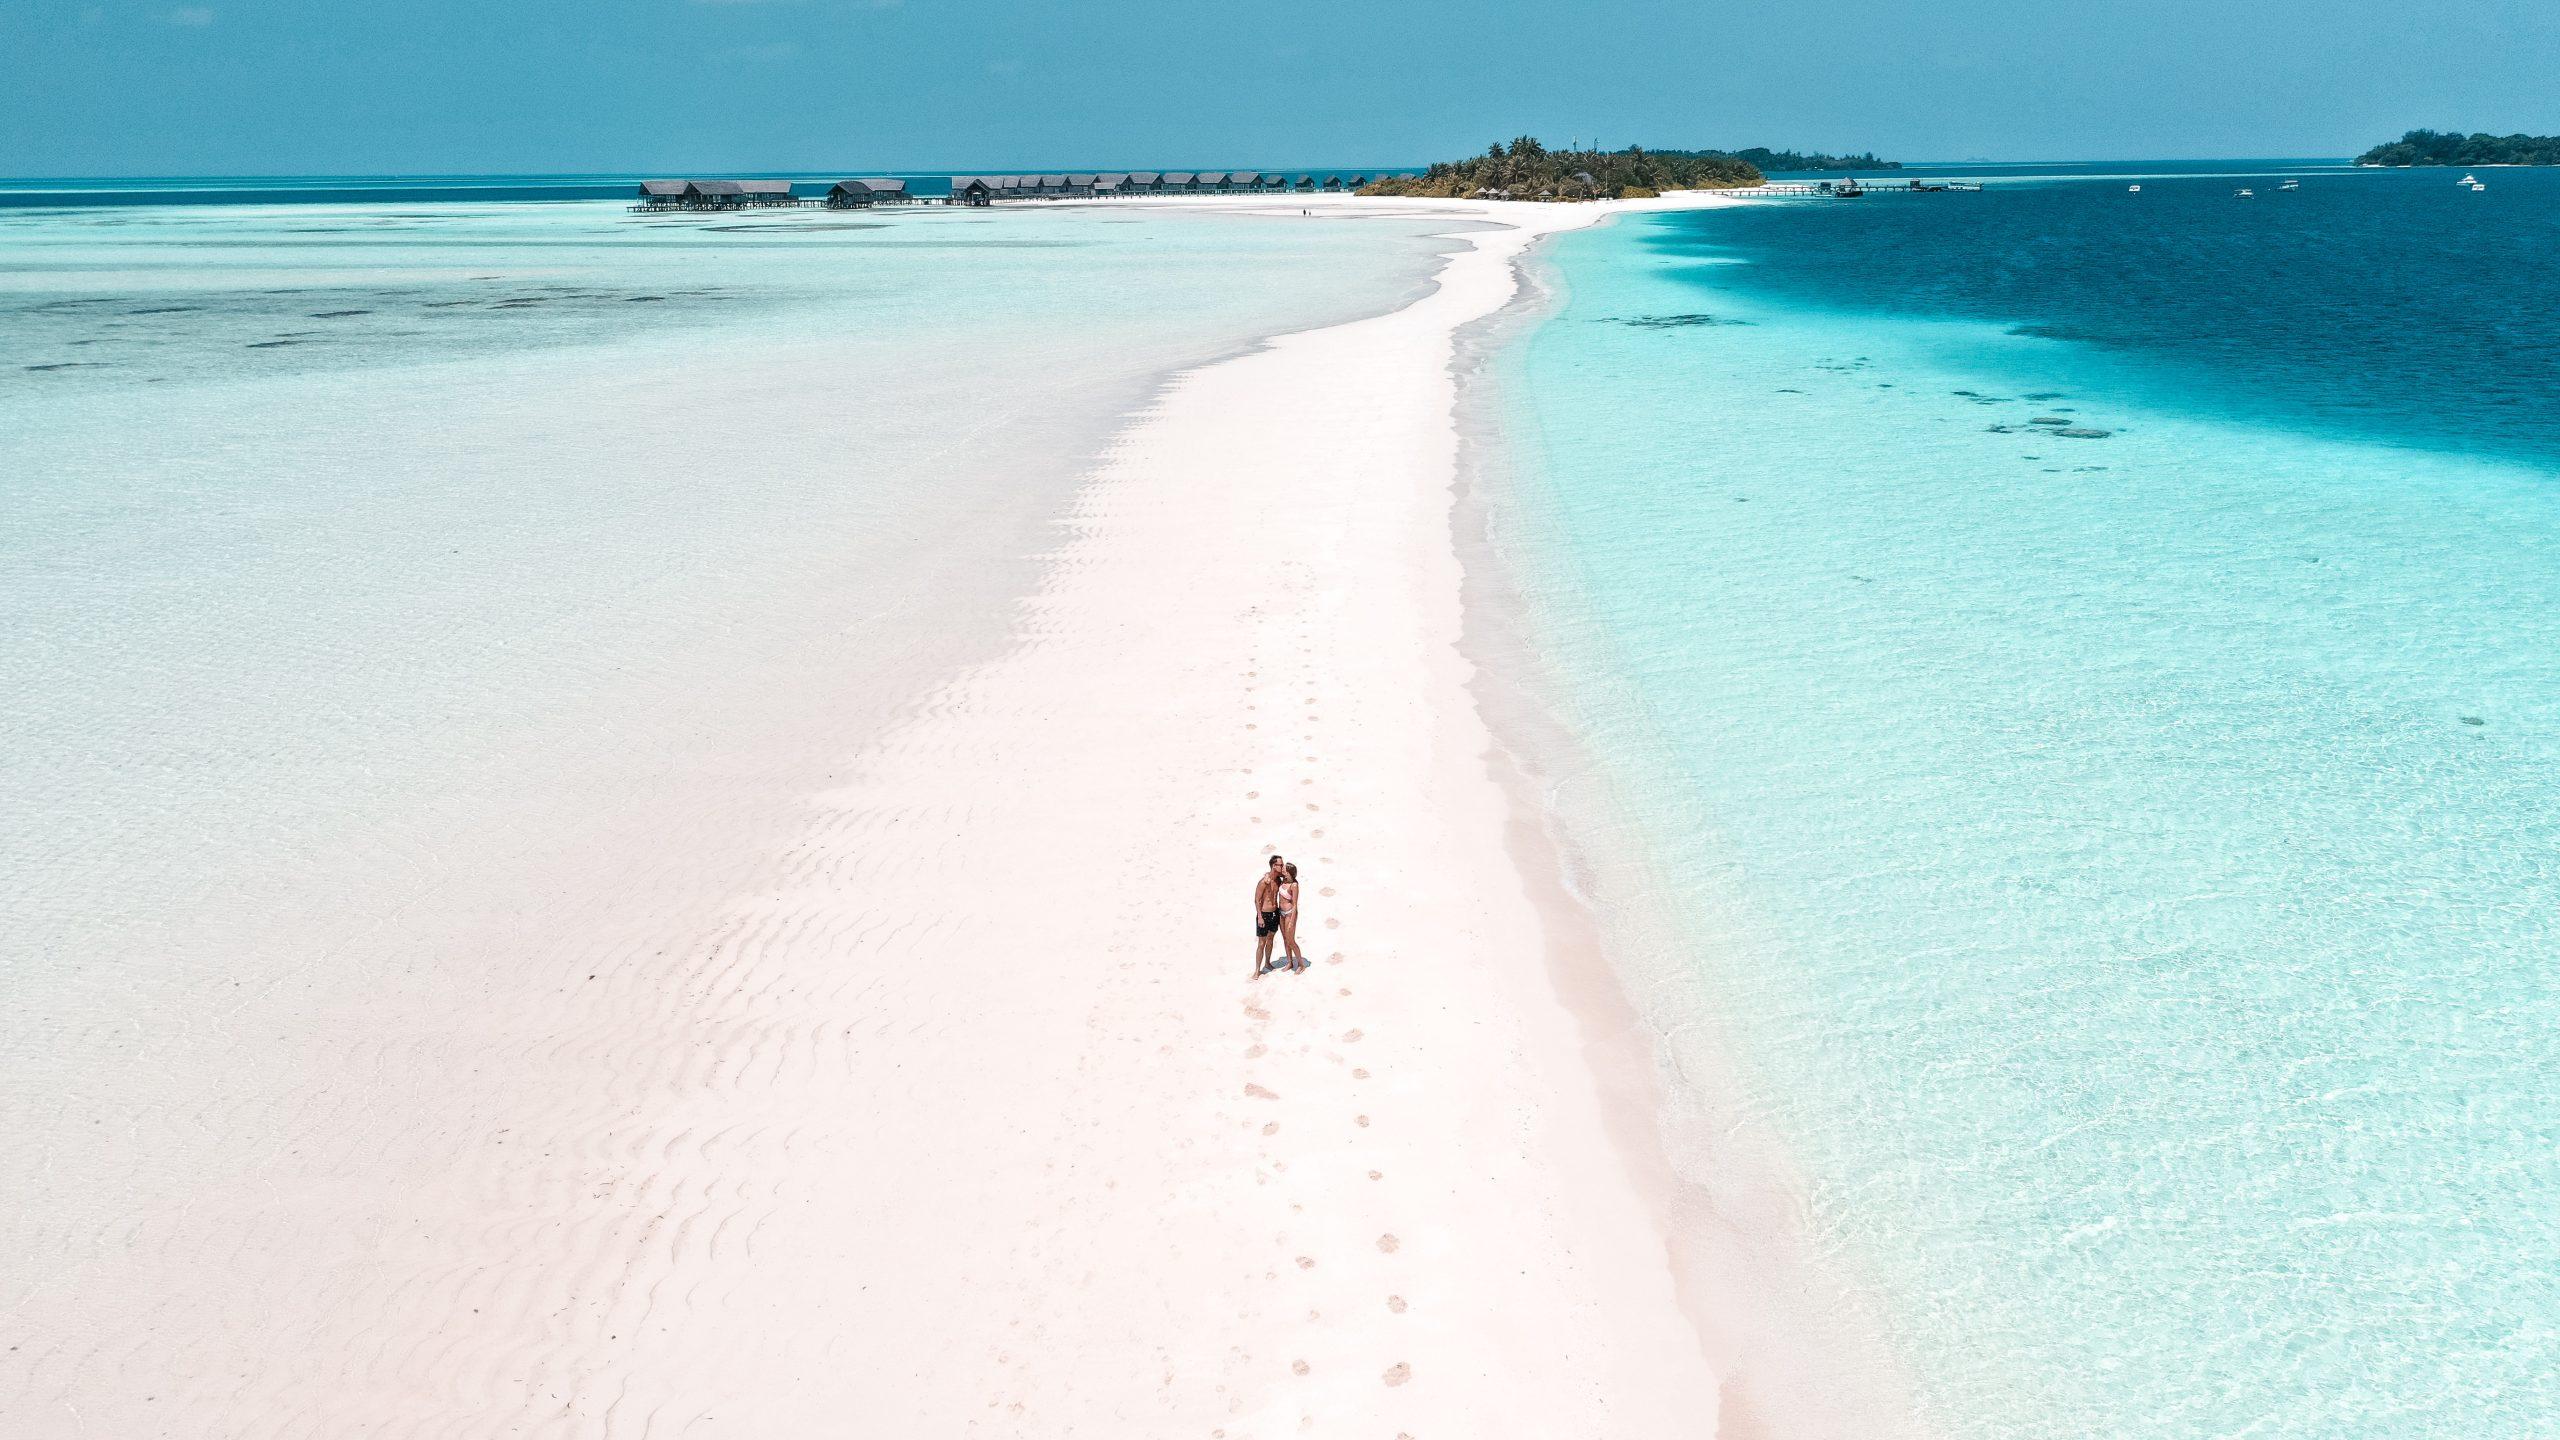 Prachtige stranden, luxe resorts | Malediven activiteiten